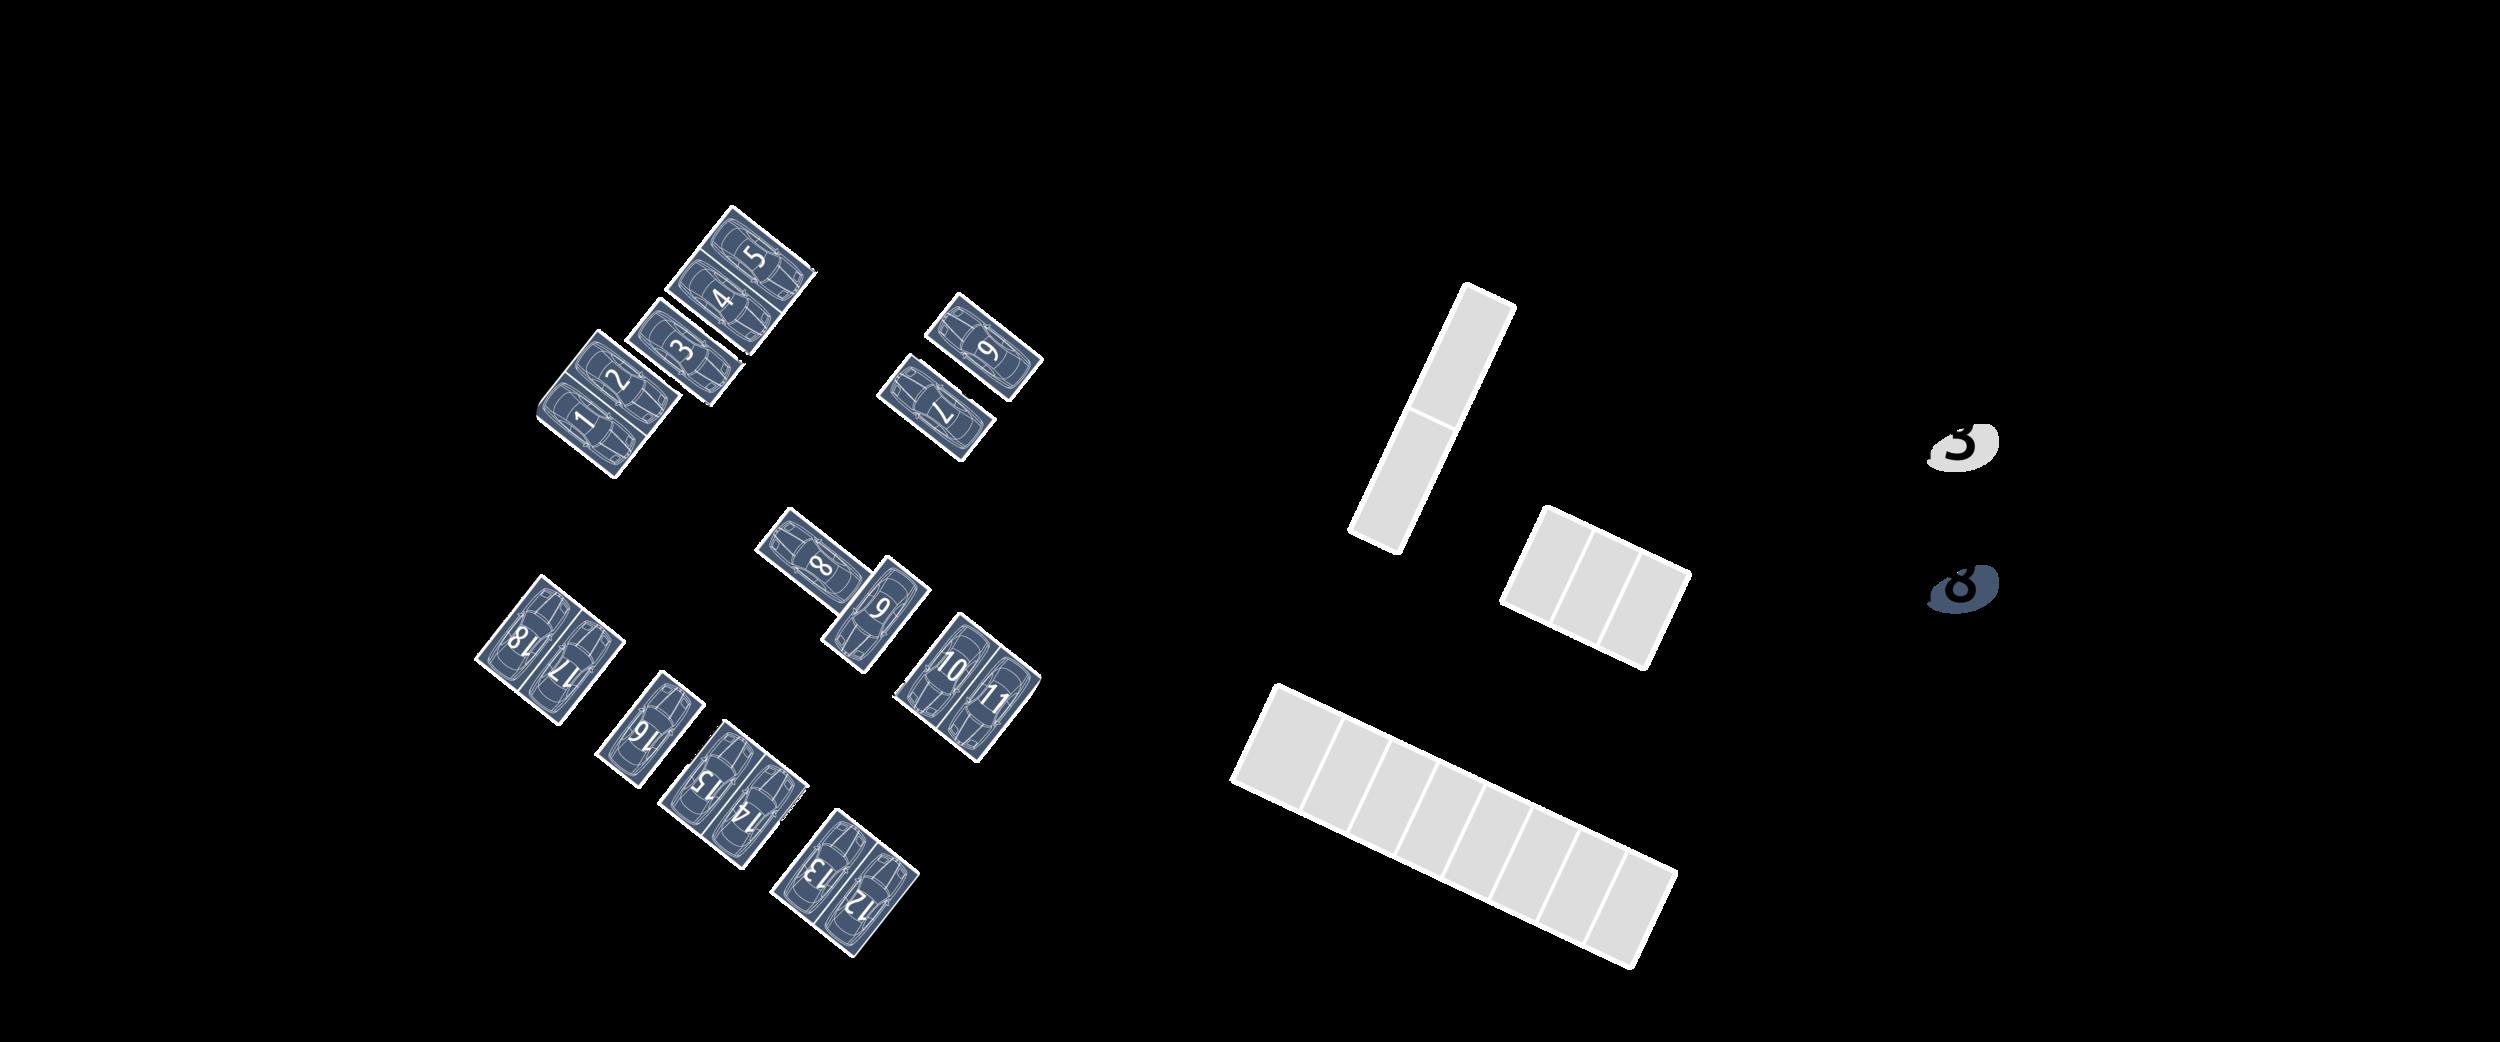 Stusa - Ukr-05.png